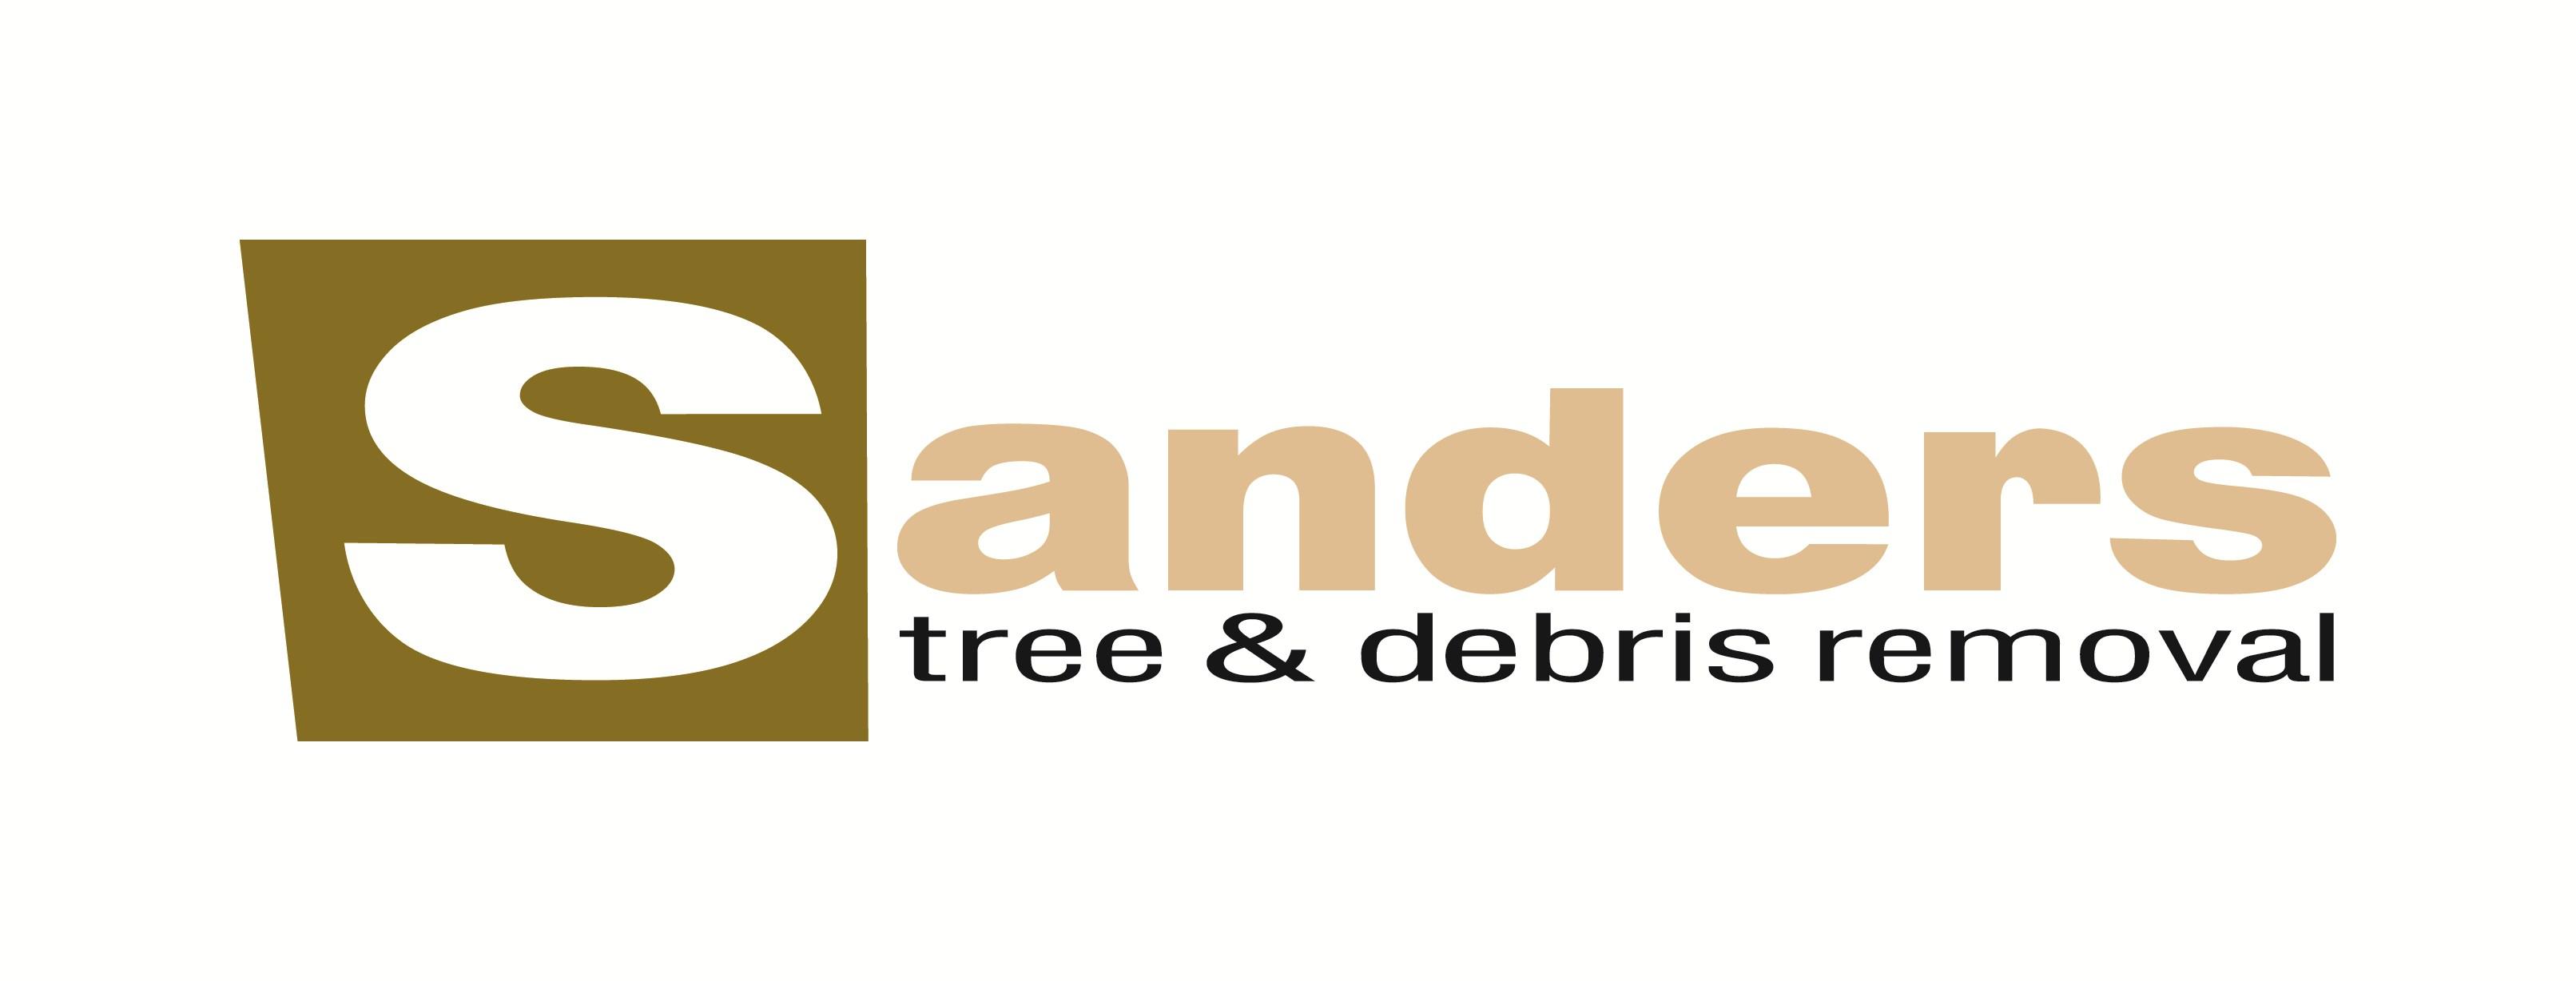 Sanders Tree & Debris Removal logo